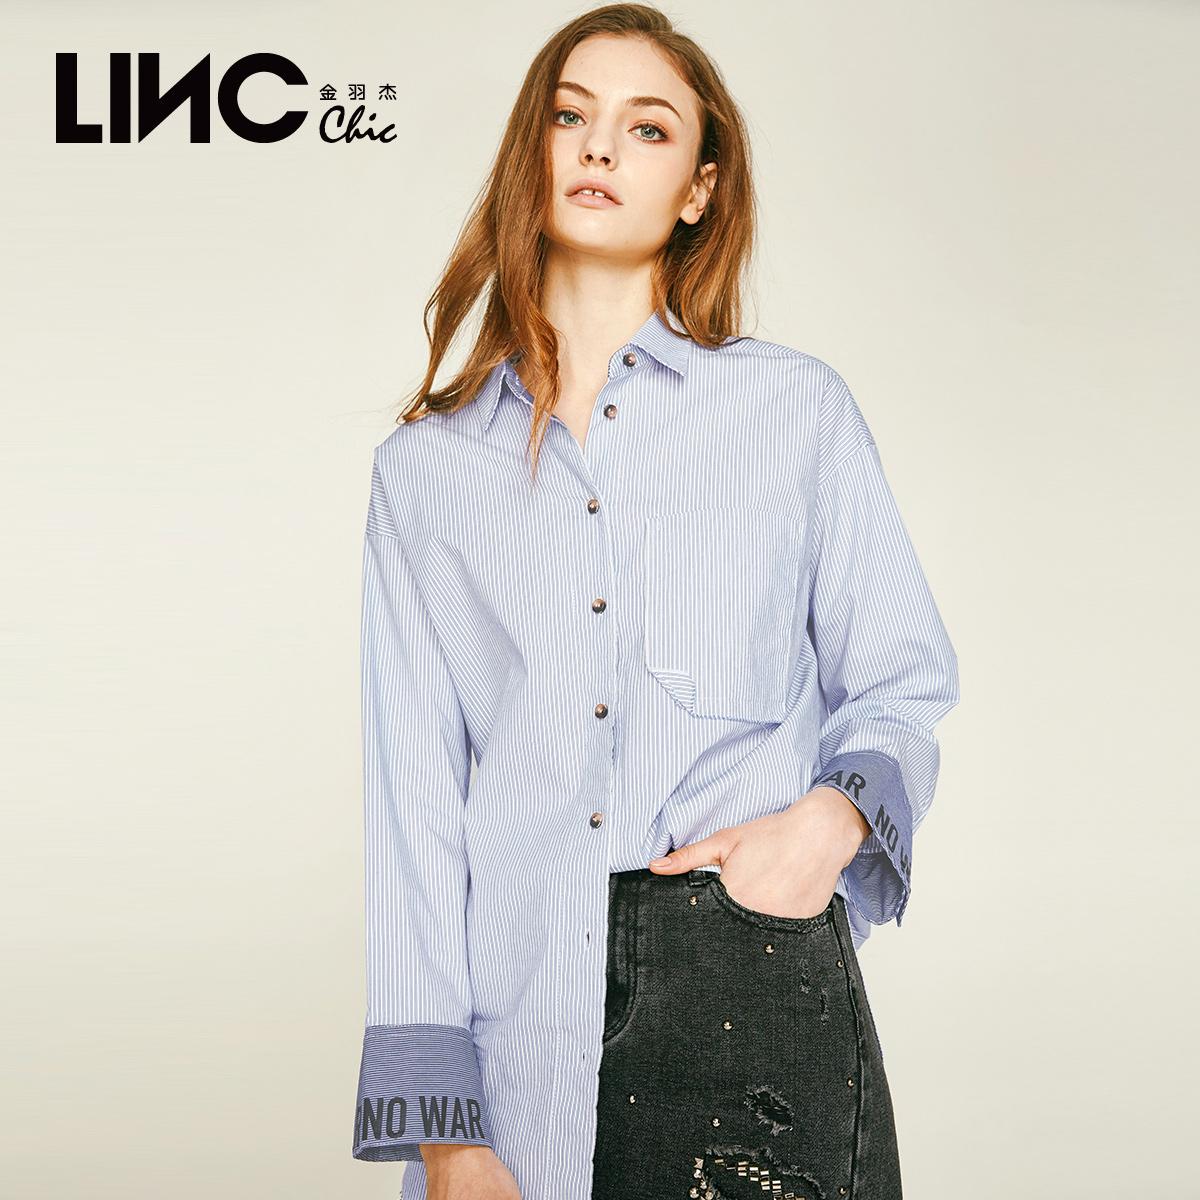 Jin Yujie genuine autumn new letter print stitching long sleeve stripe casual loose shirt womens 8111605